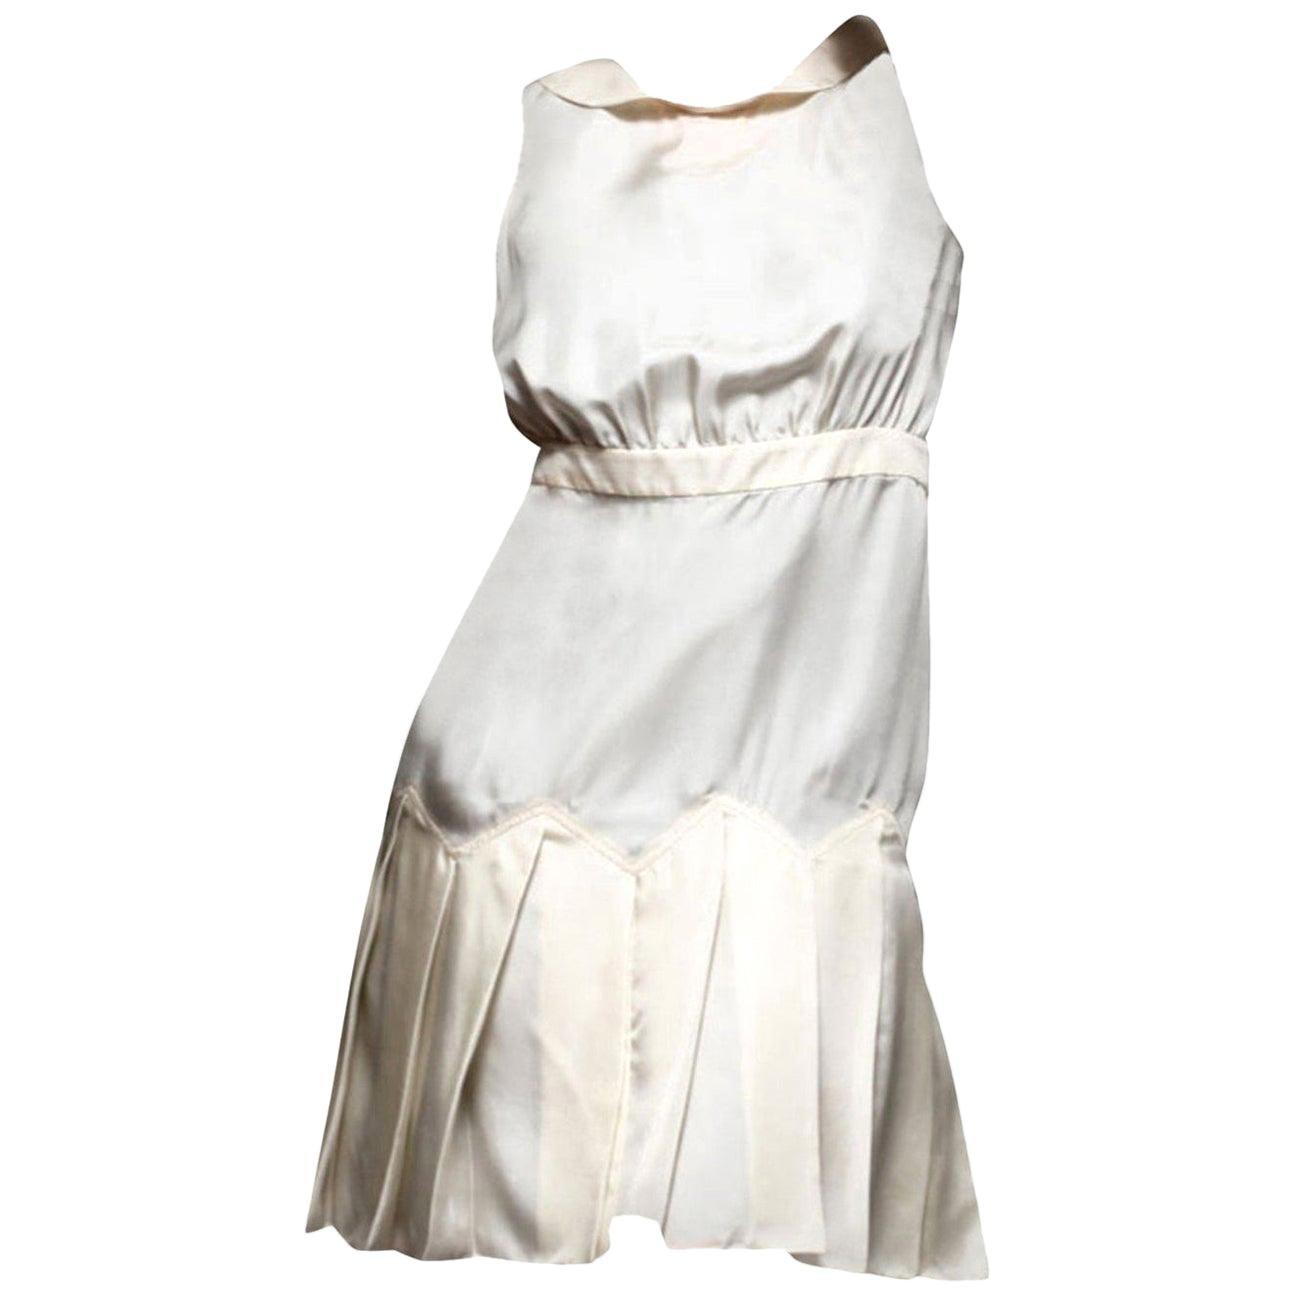 New Vera Wang Lavender Label Silk Peter Pan Dress Sz 6